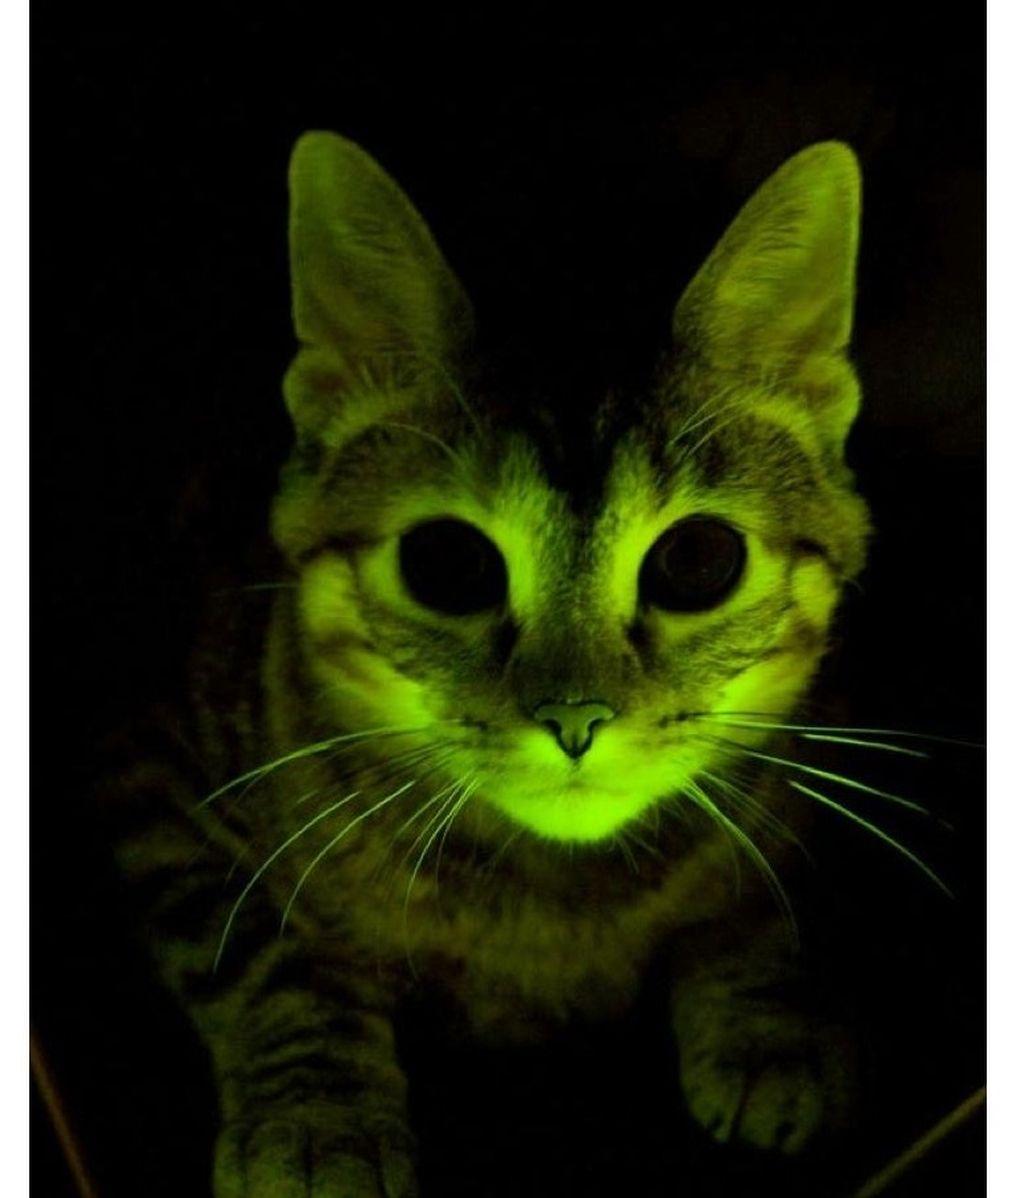 Gatos fluorescentes para combatir el VIH